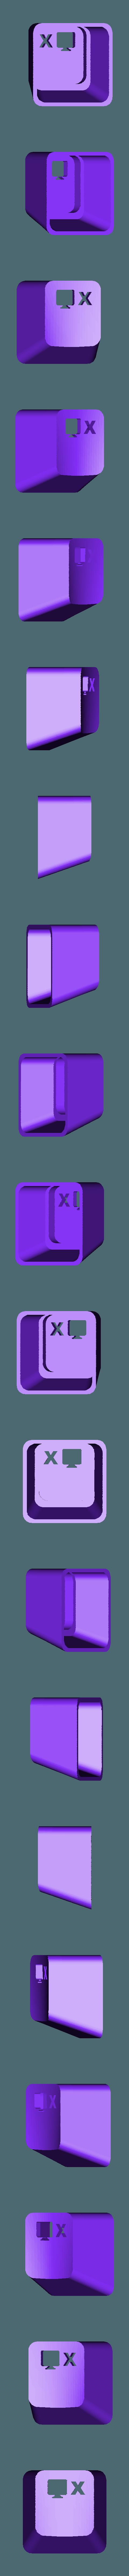 key_SWP_X.stl Download free STL file Key cap • 3D printing object, MakeItWork